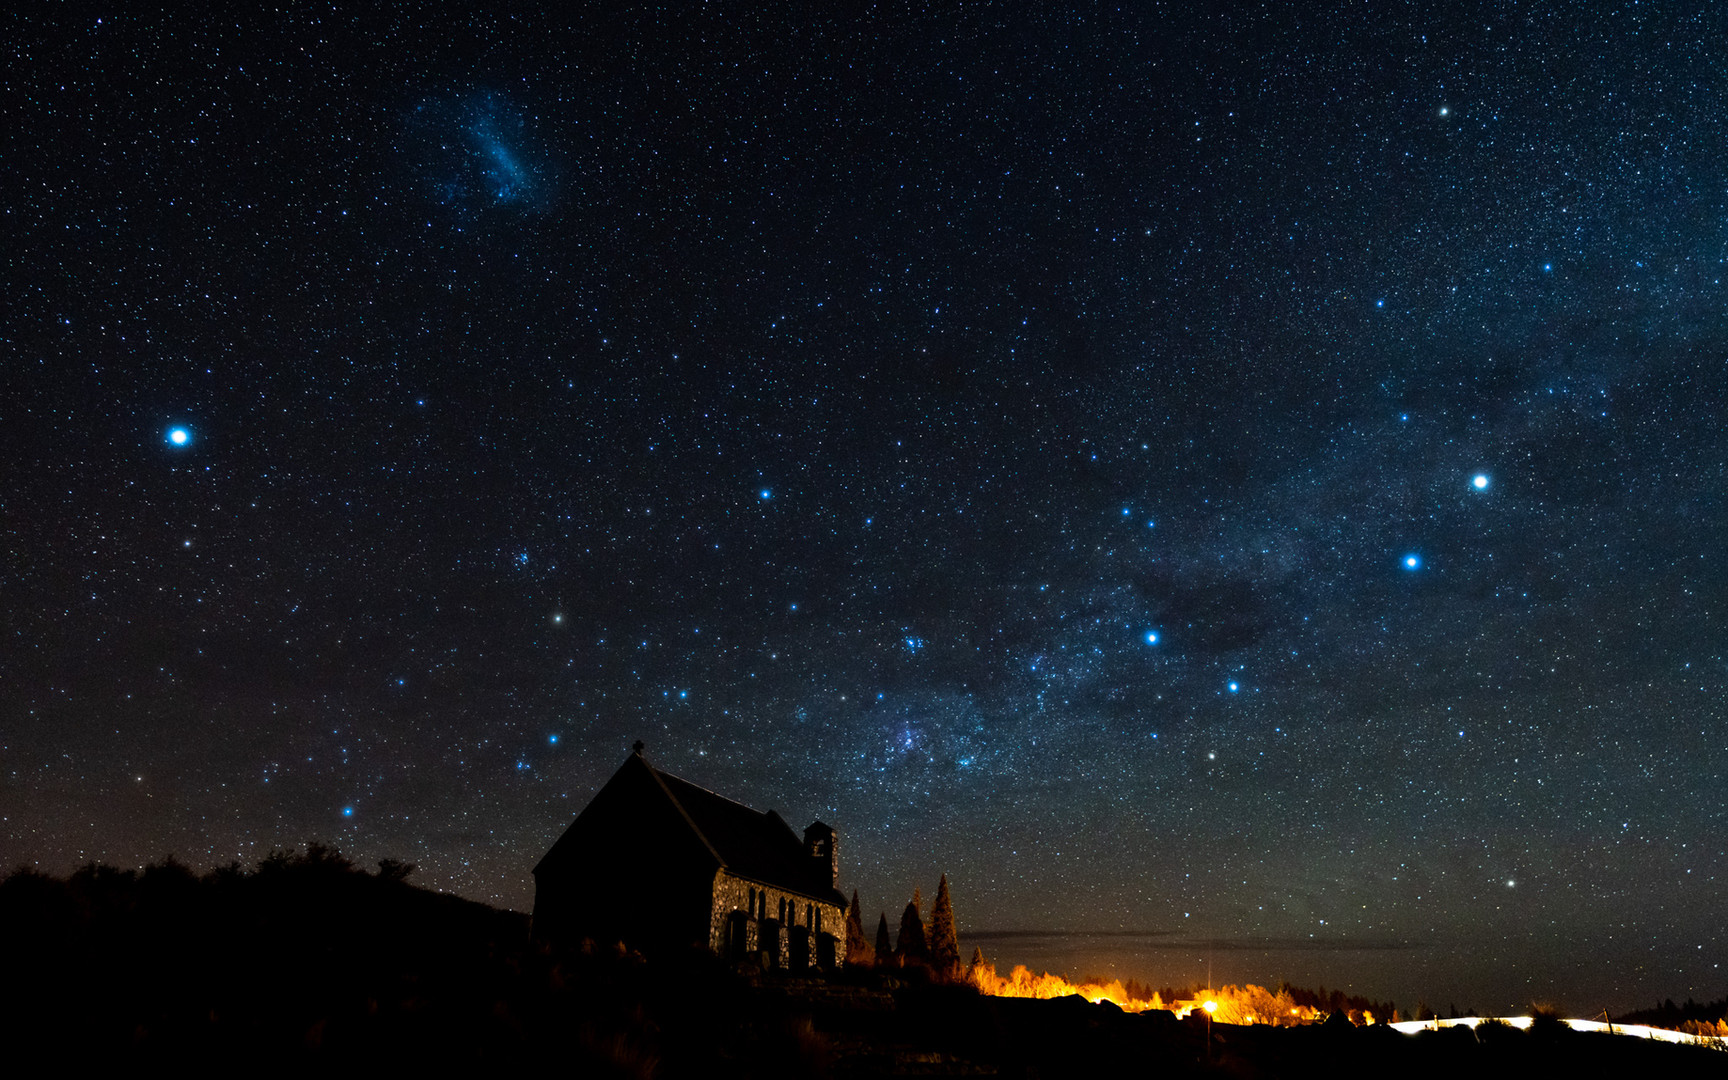 nz-new-Zealand-church-tekapo-astrophotog